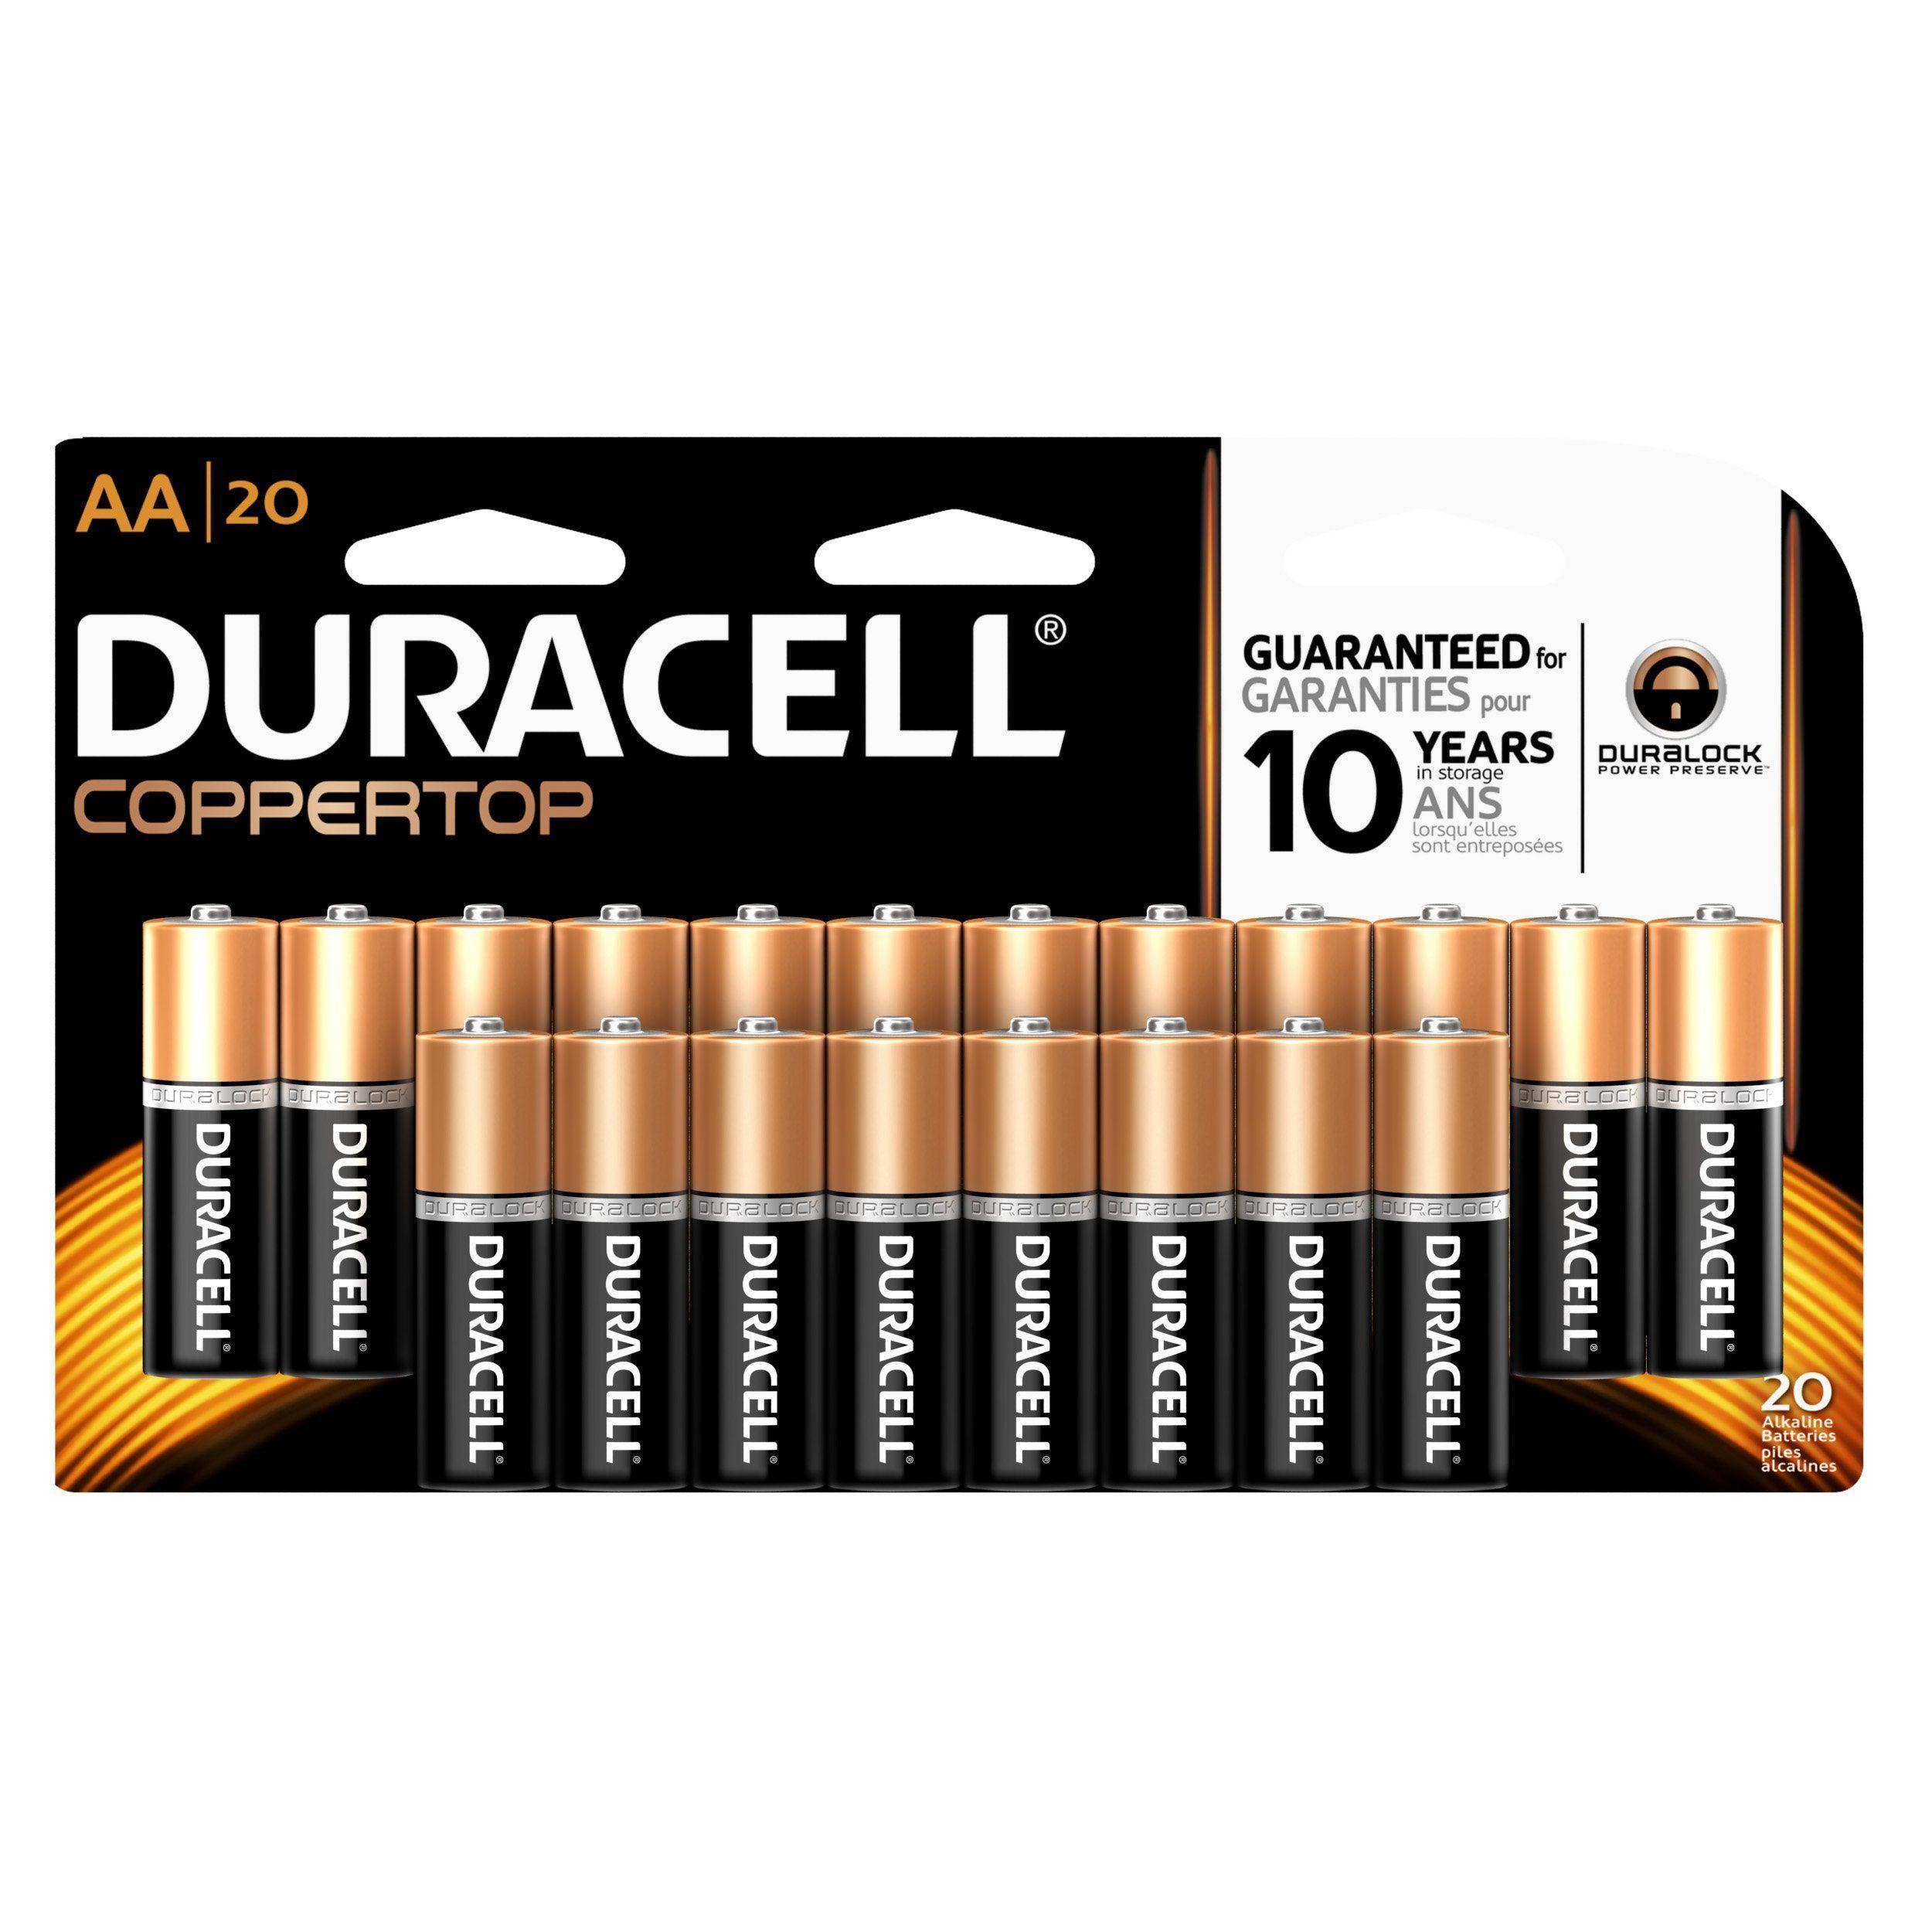 Duracell Coppertop Aa Alkaline Batteries 20 Count Duracell Alkaline Battery Charger Accessories